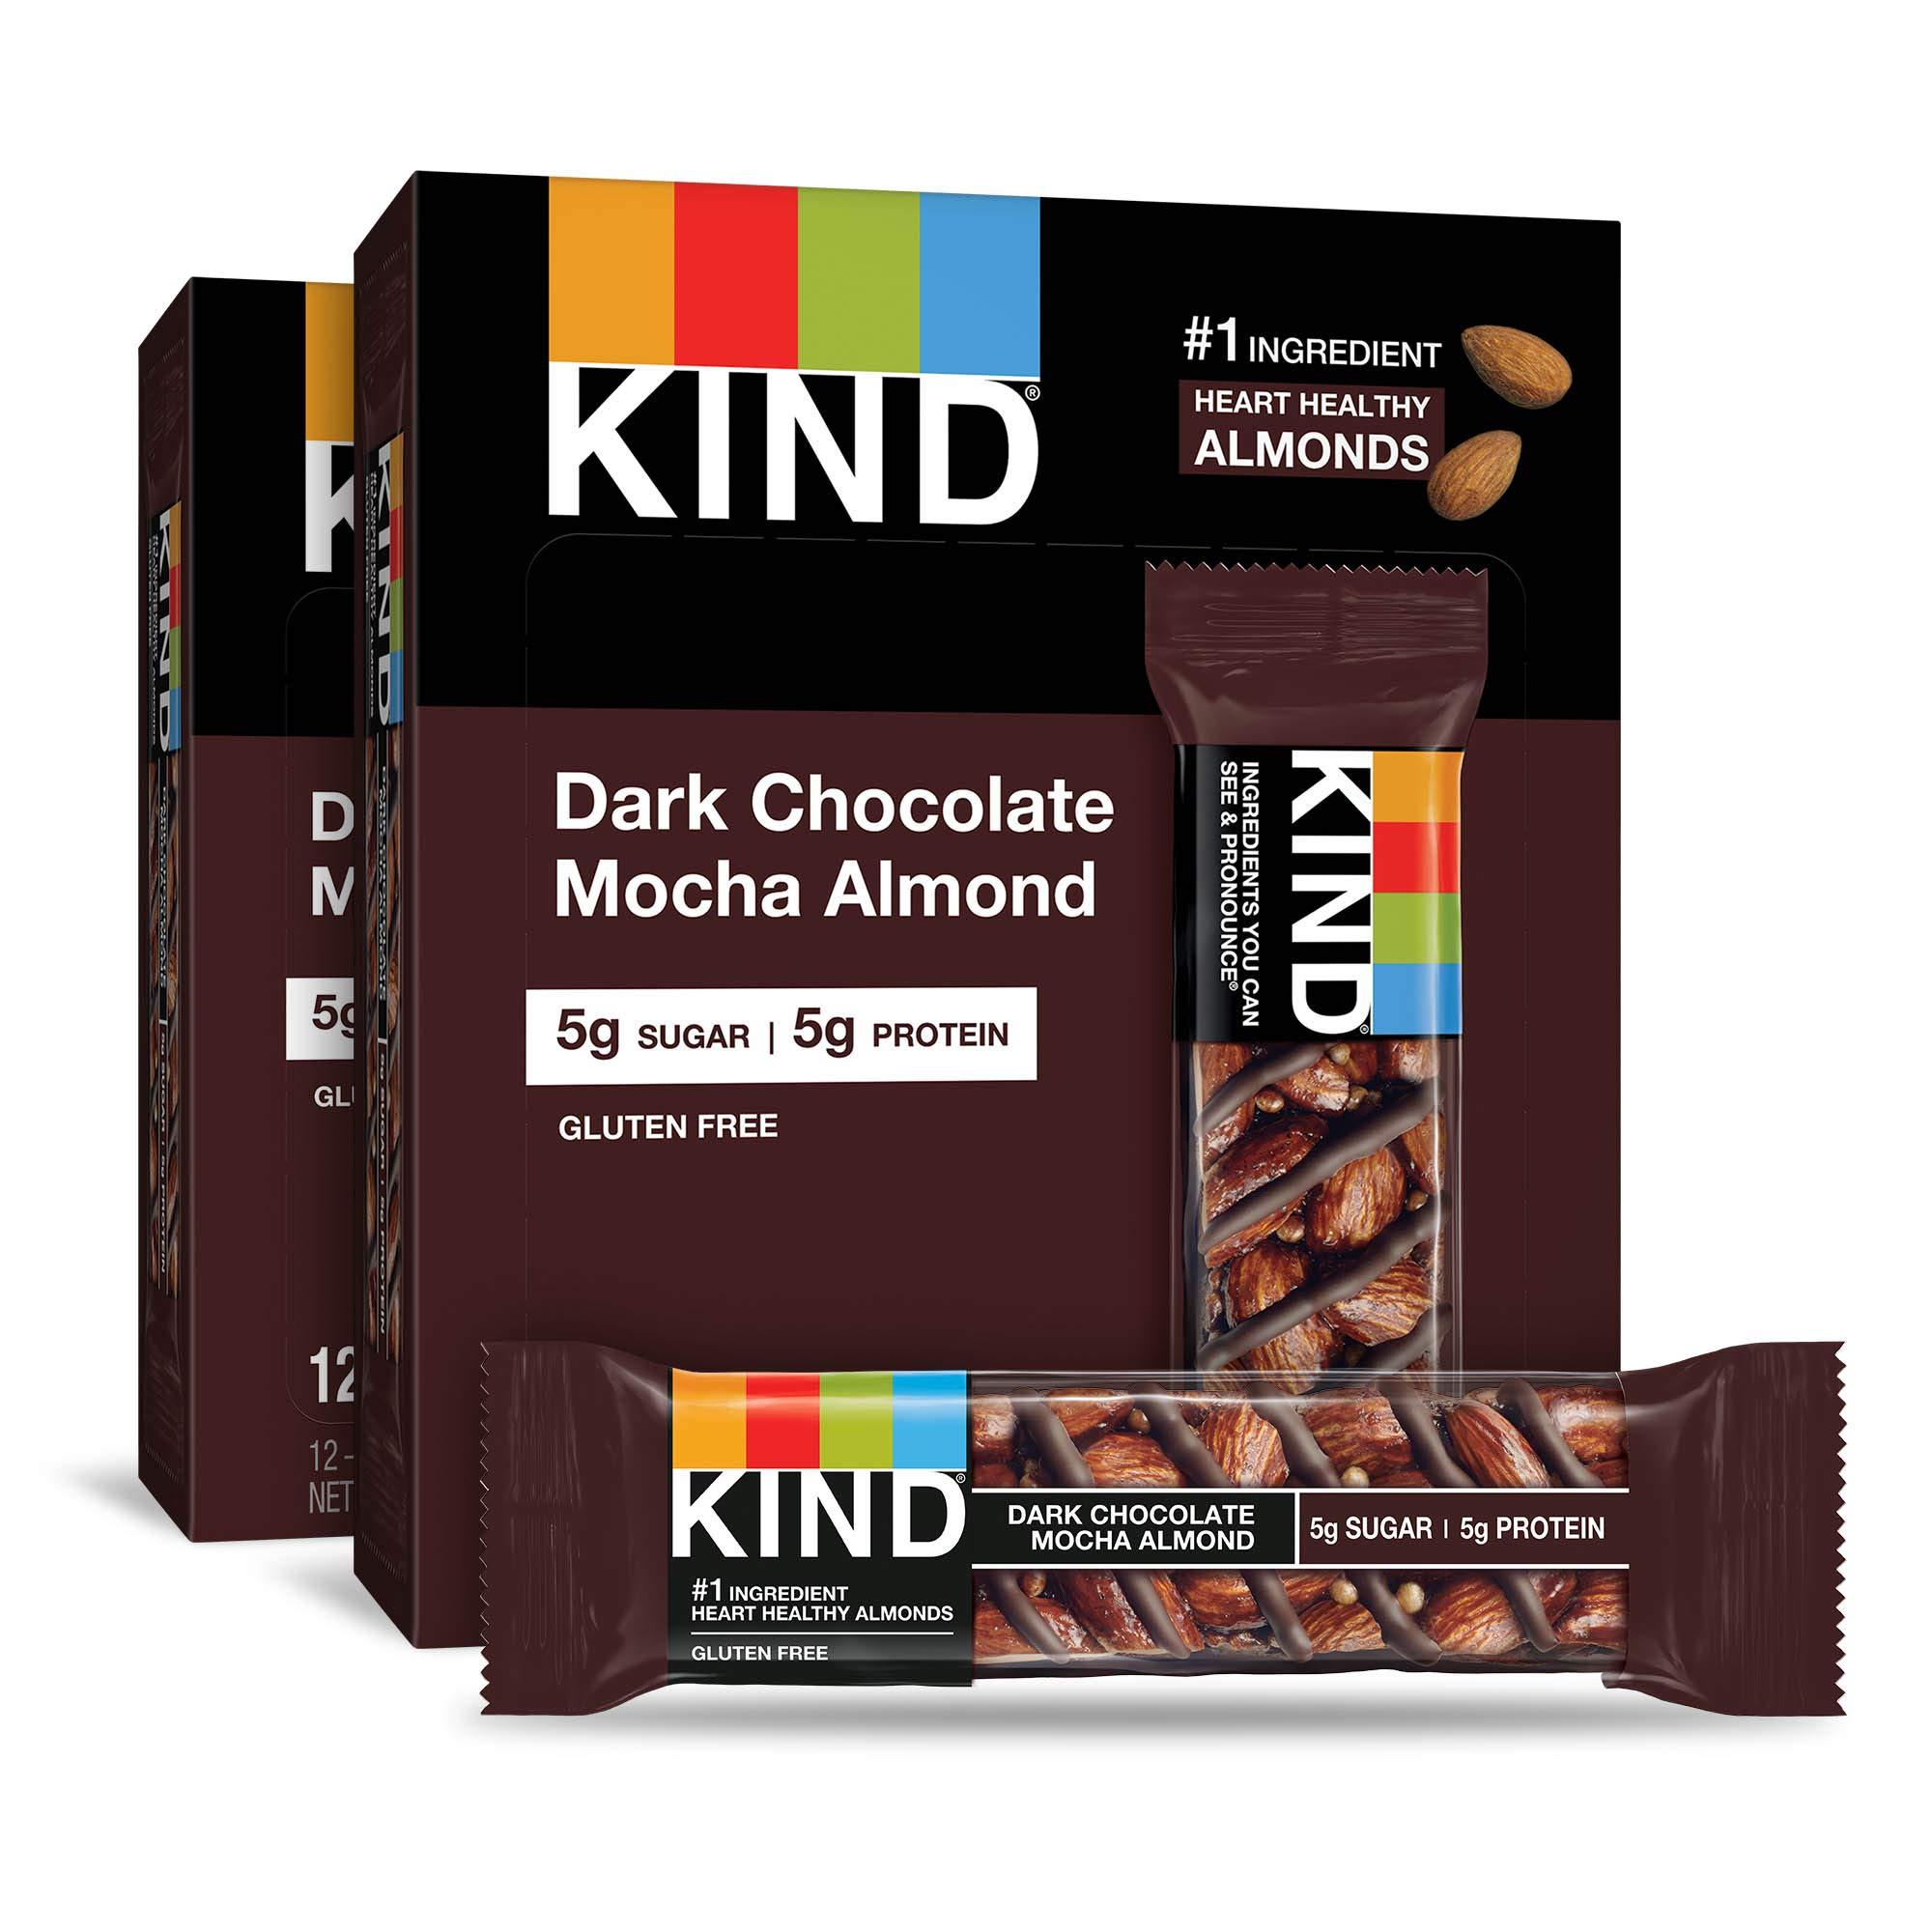 KIND Bars, Dark Chocolate Mocha Almond, Gluten Free, Low Sugar, 1.4 Ounce Bars, 24 Count by KIND